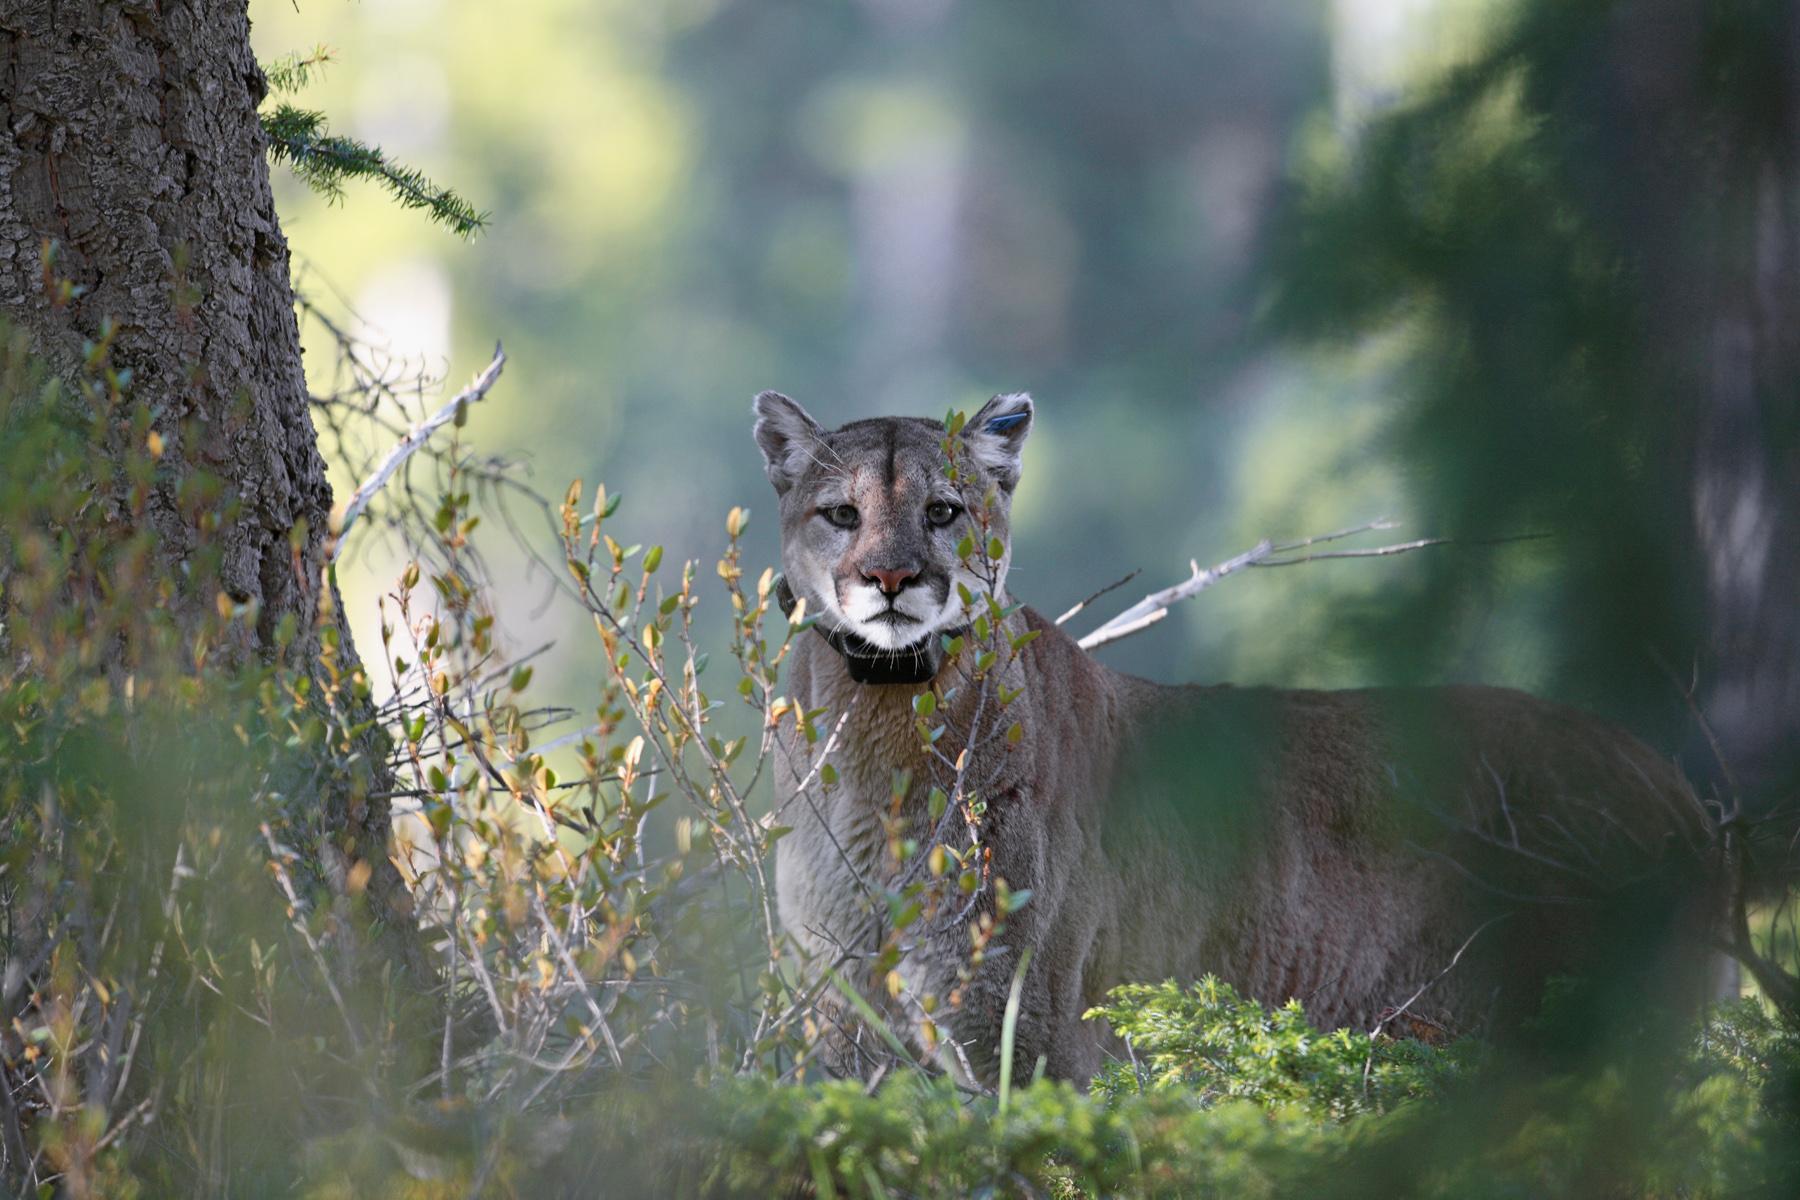 Doug the Cougar, photo by John Marriott